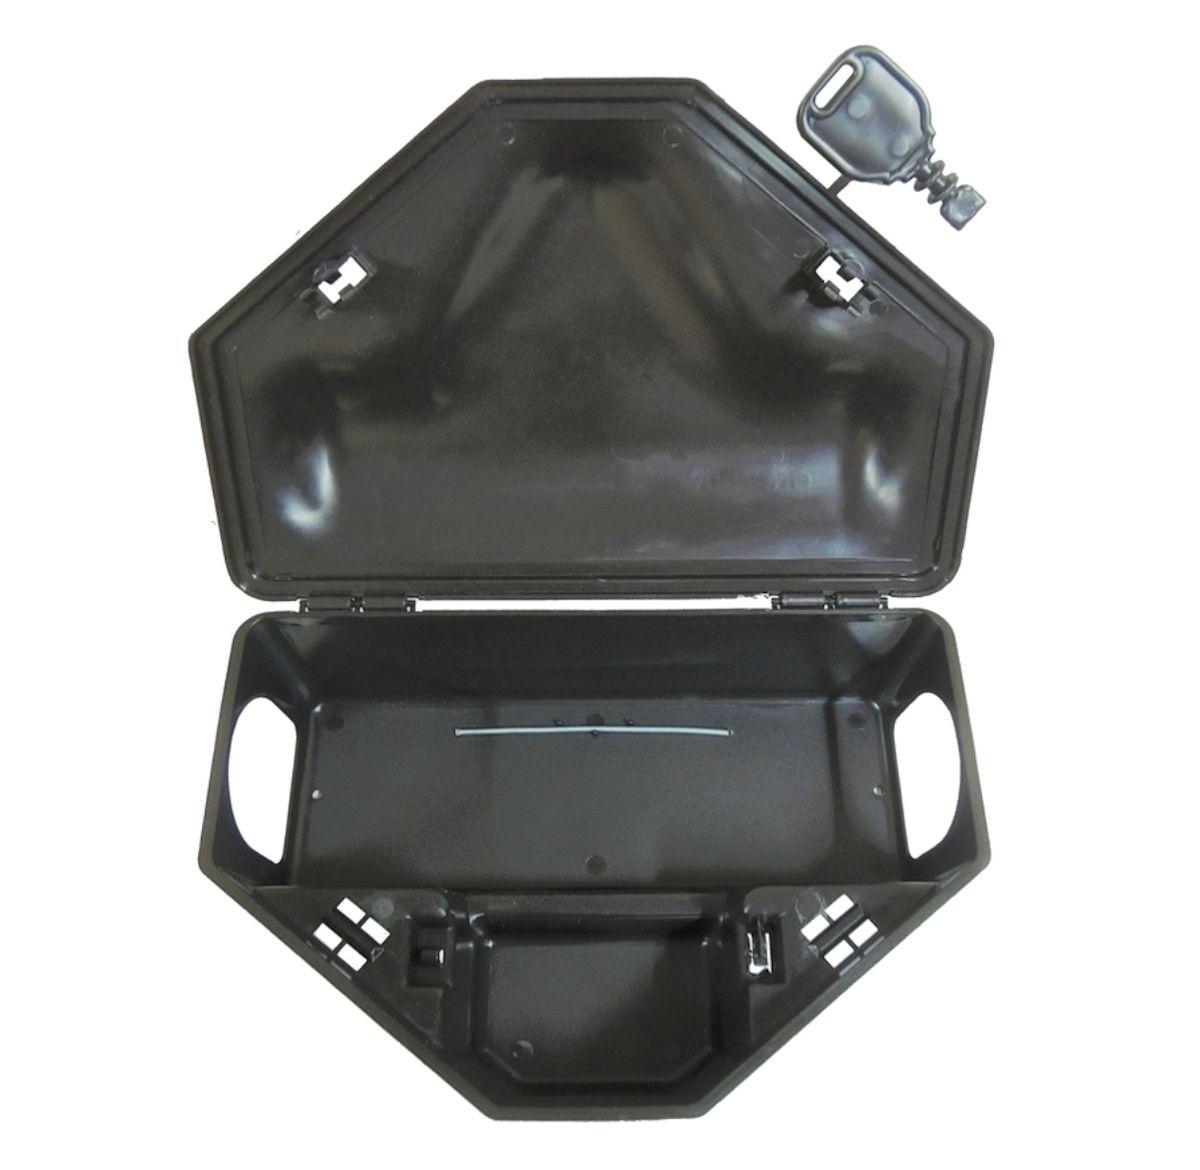 KIT 95 Porta Iscas Resistentes 2 TRAVAS c/ Chave Mata Ratos